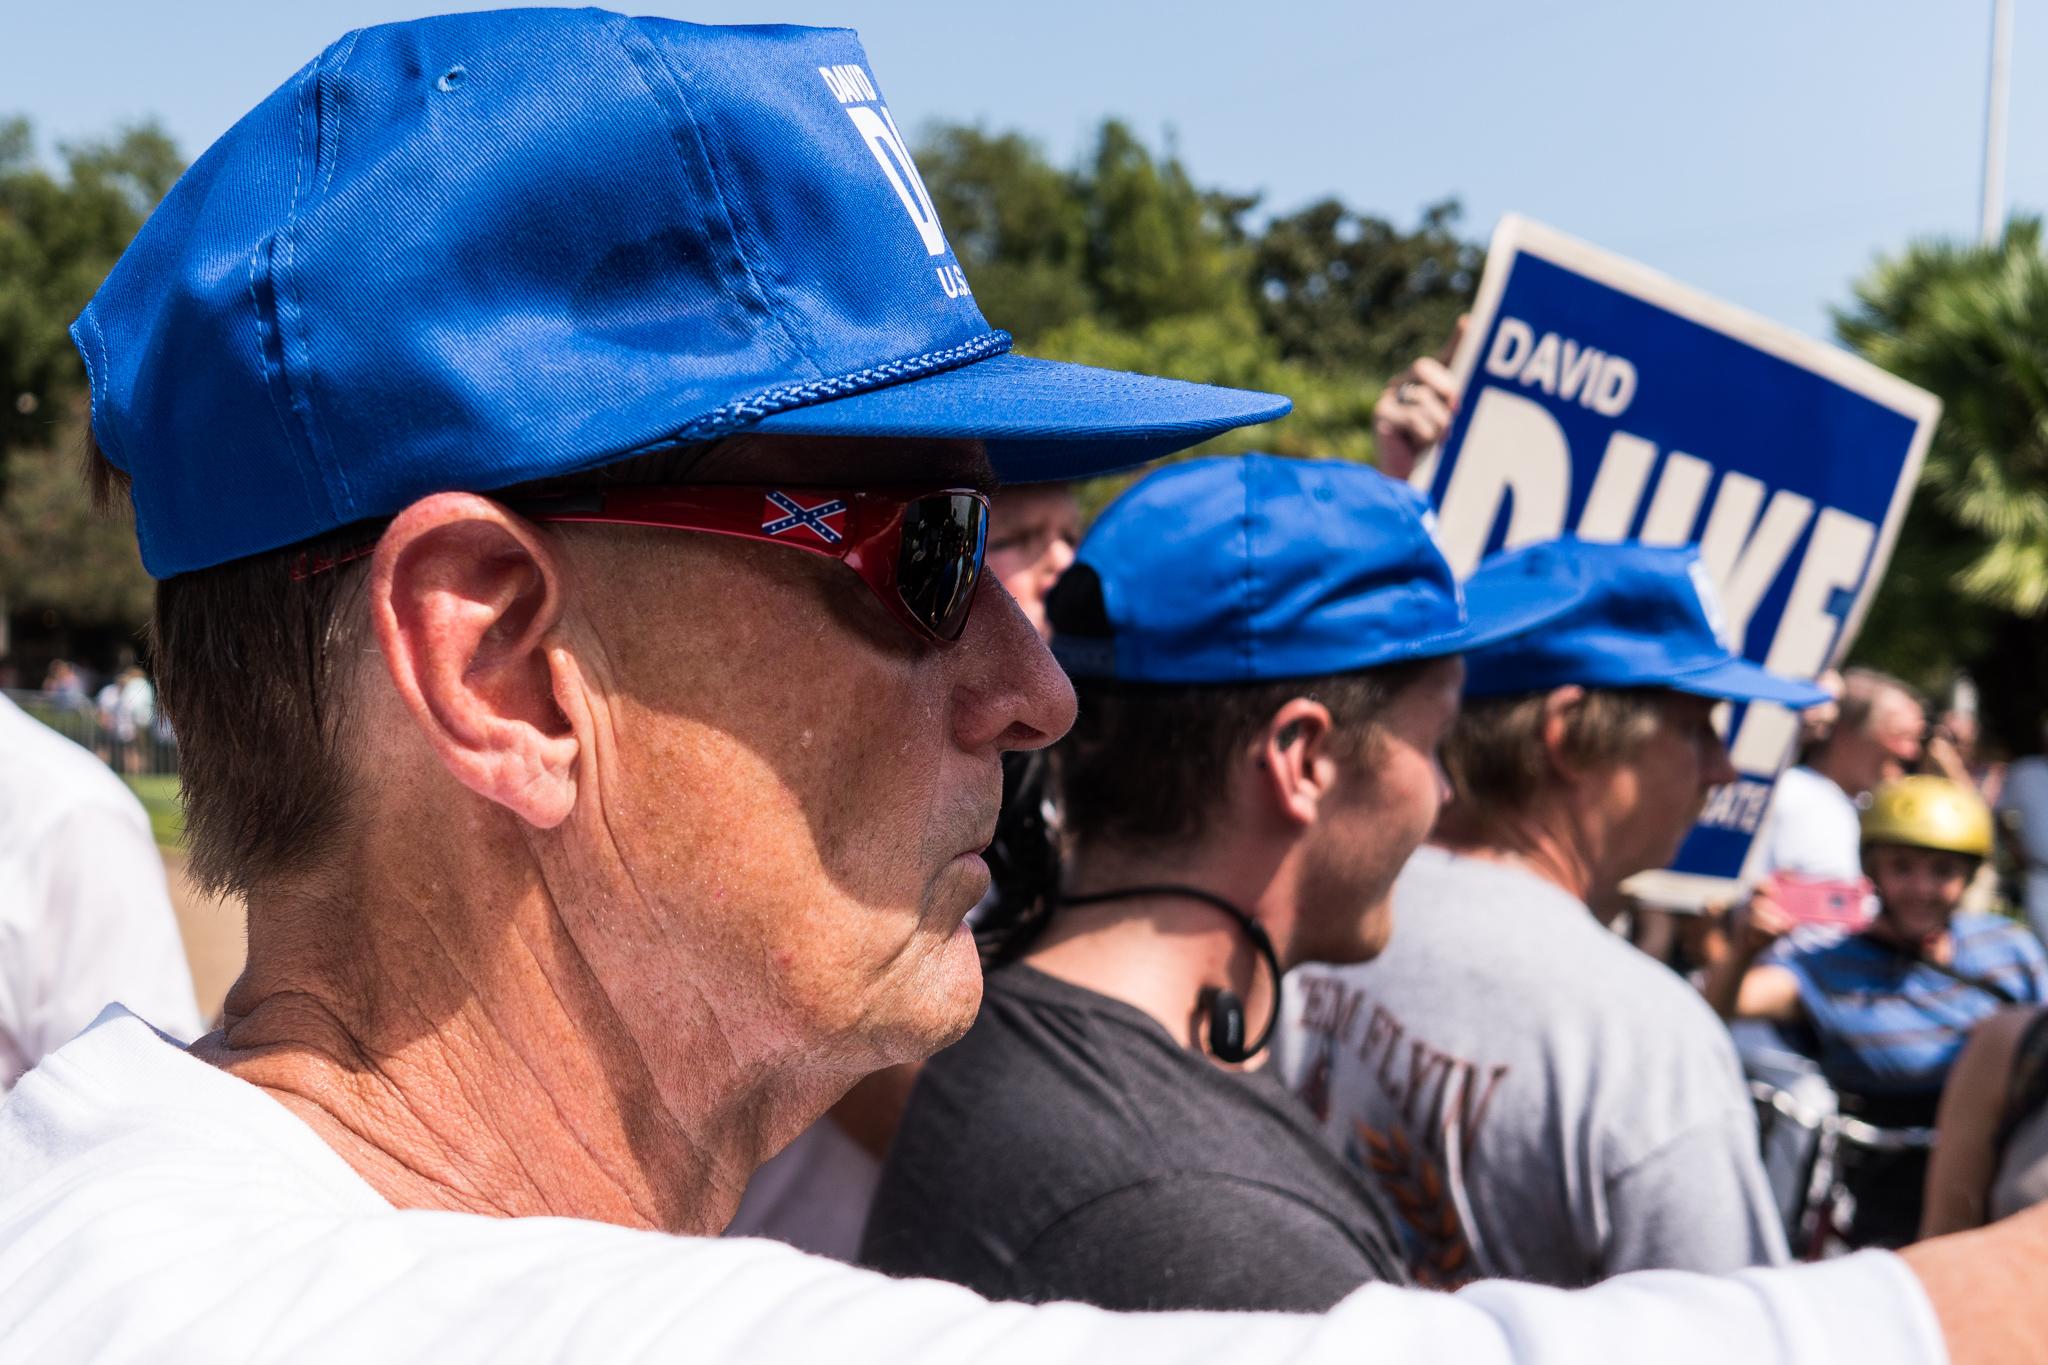 A supporter of David Duke.